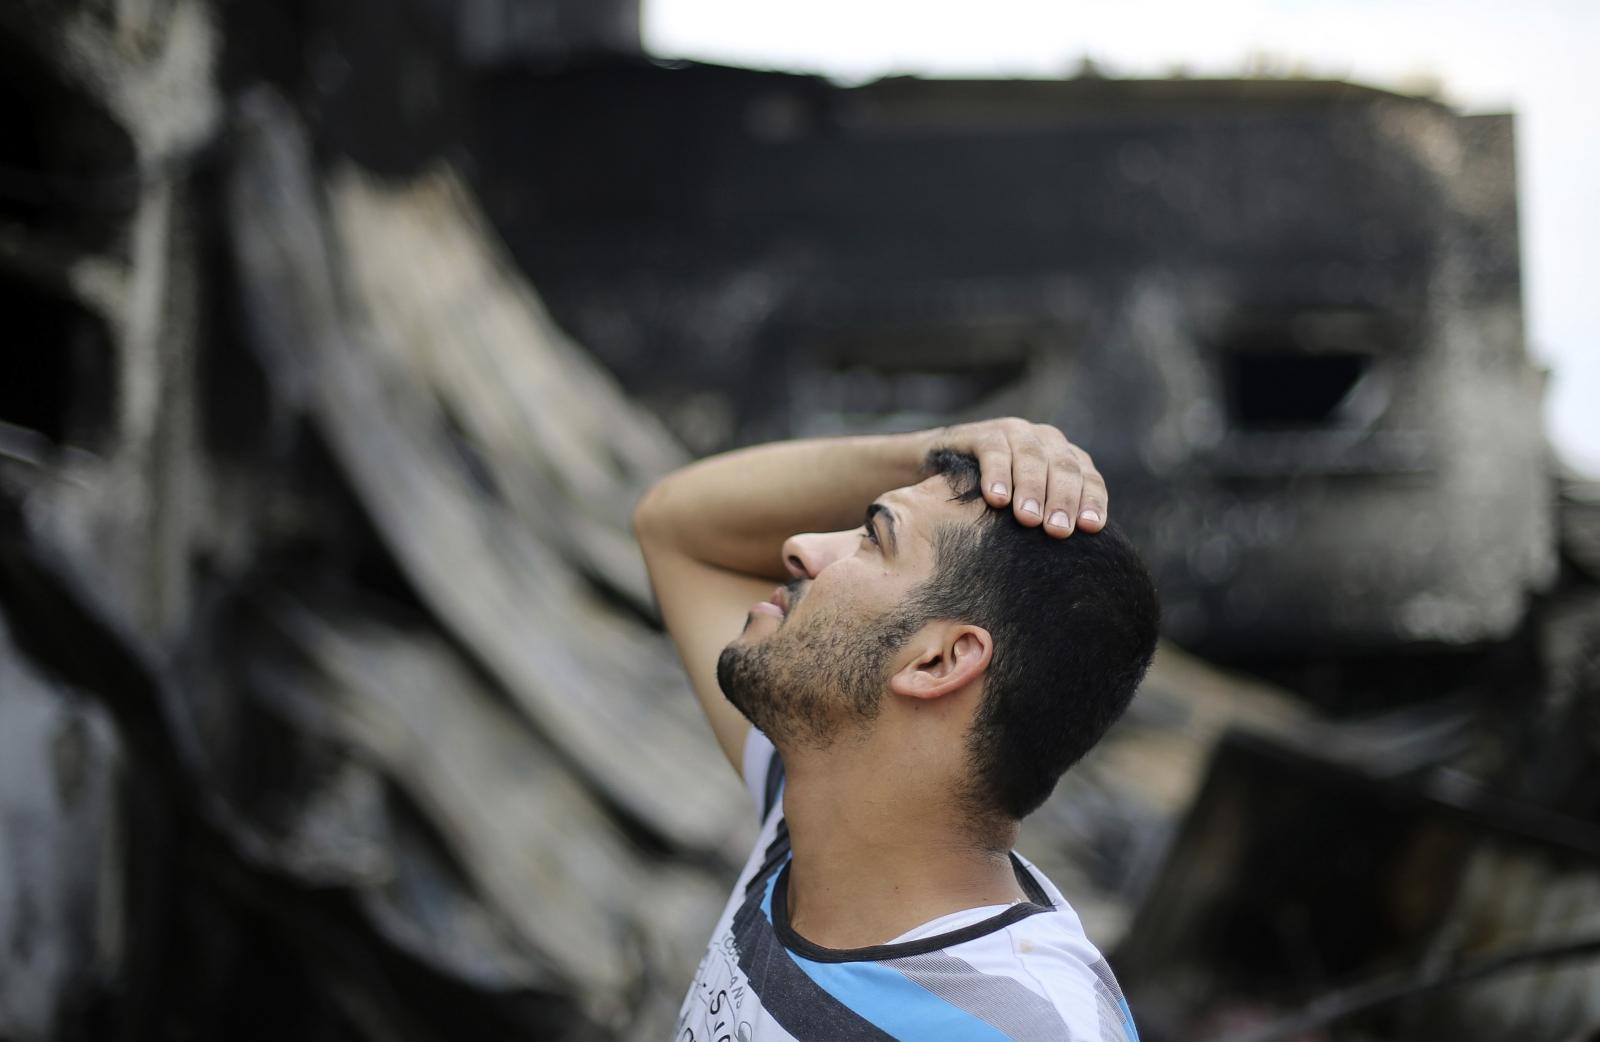 Hamas Gaza IDF Israel